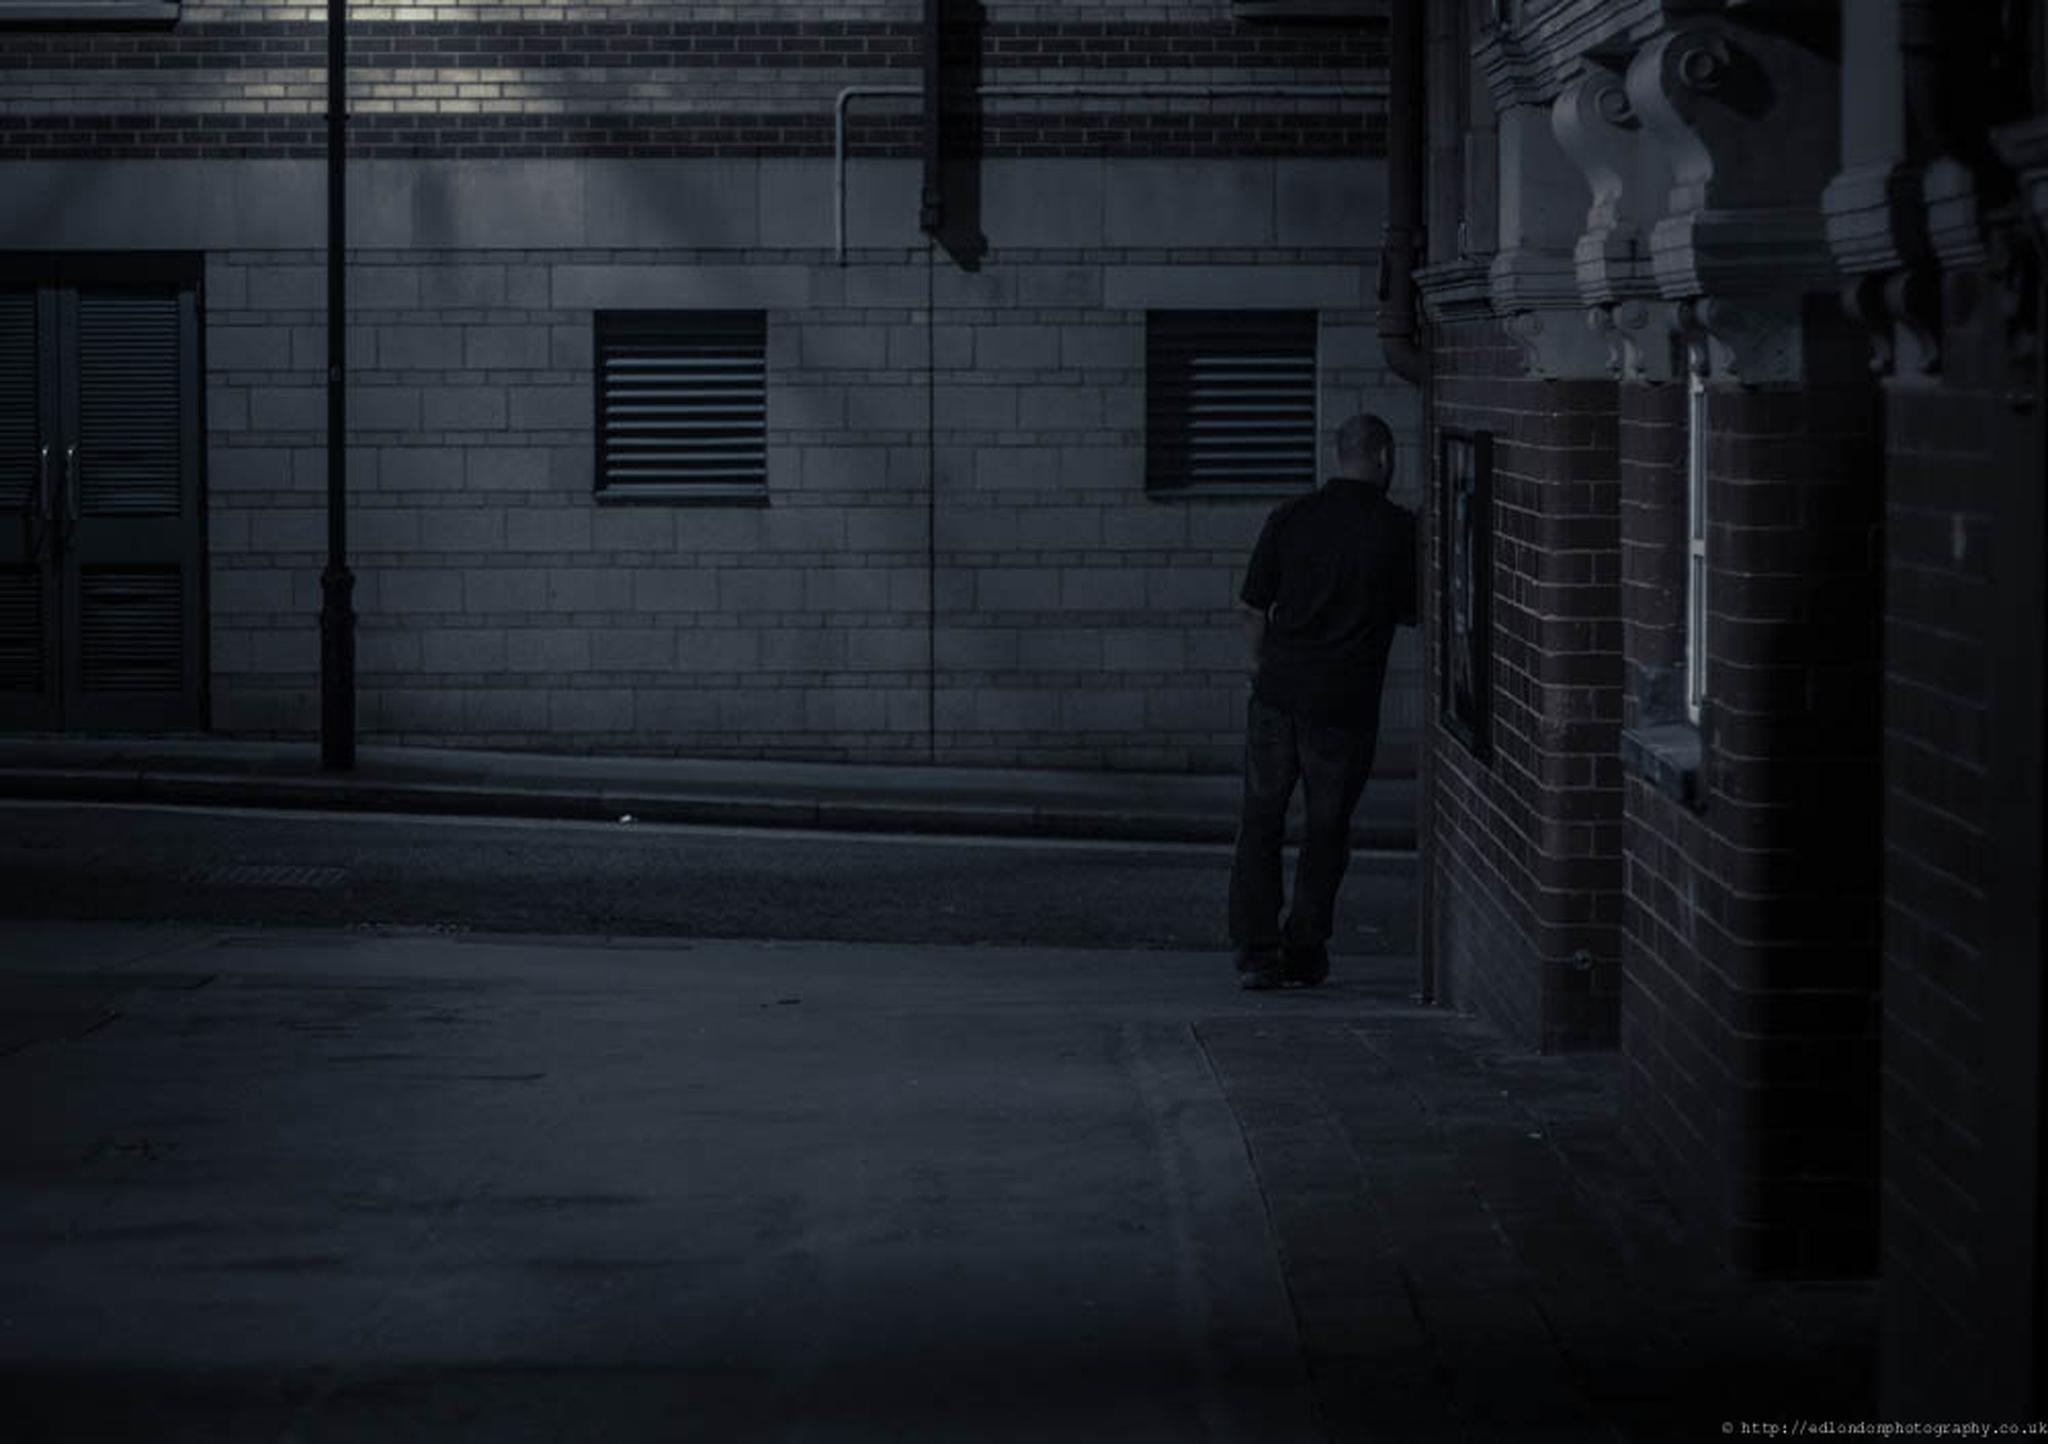 errr shall I walk or wait for him to go? by edozollo